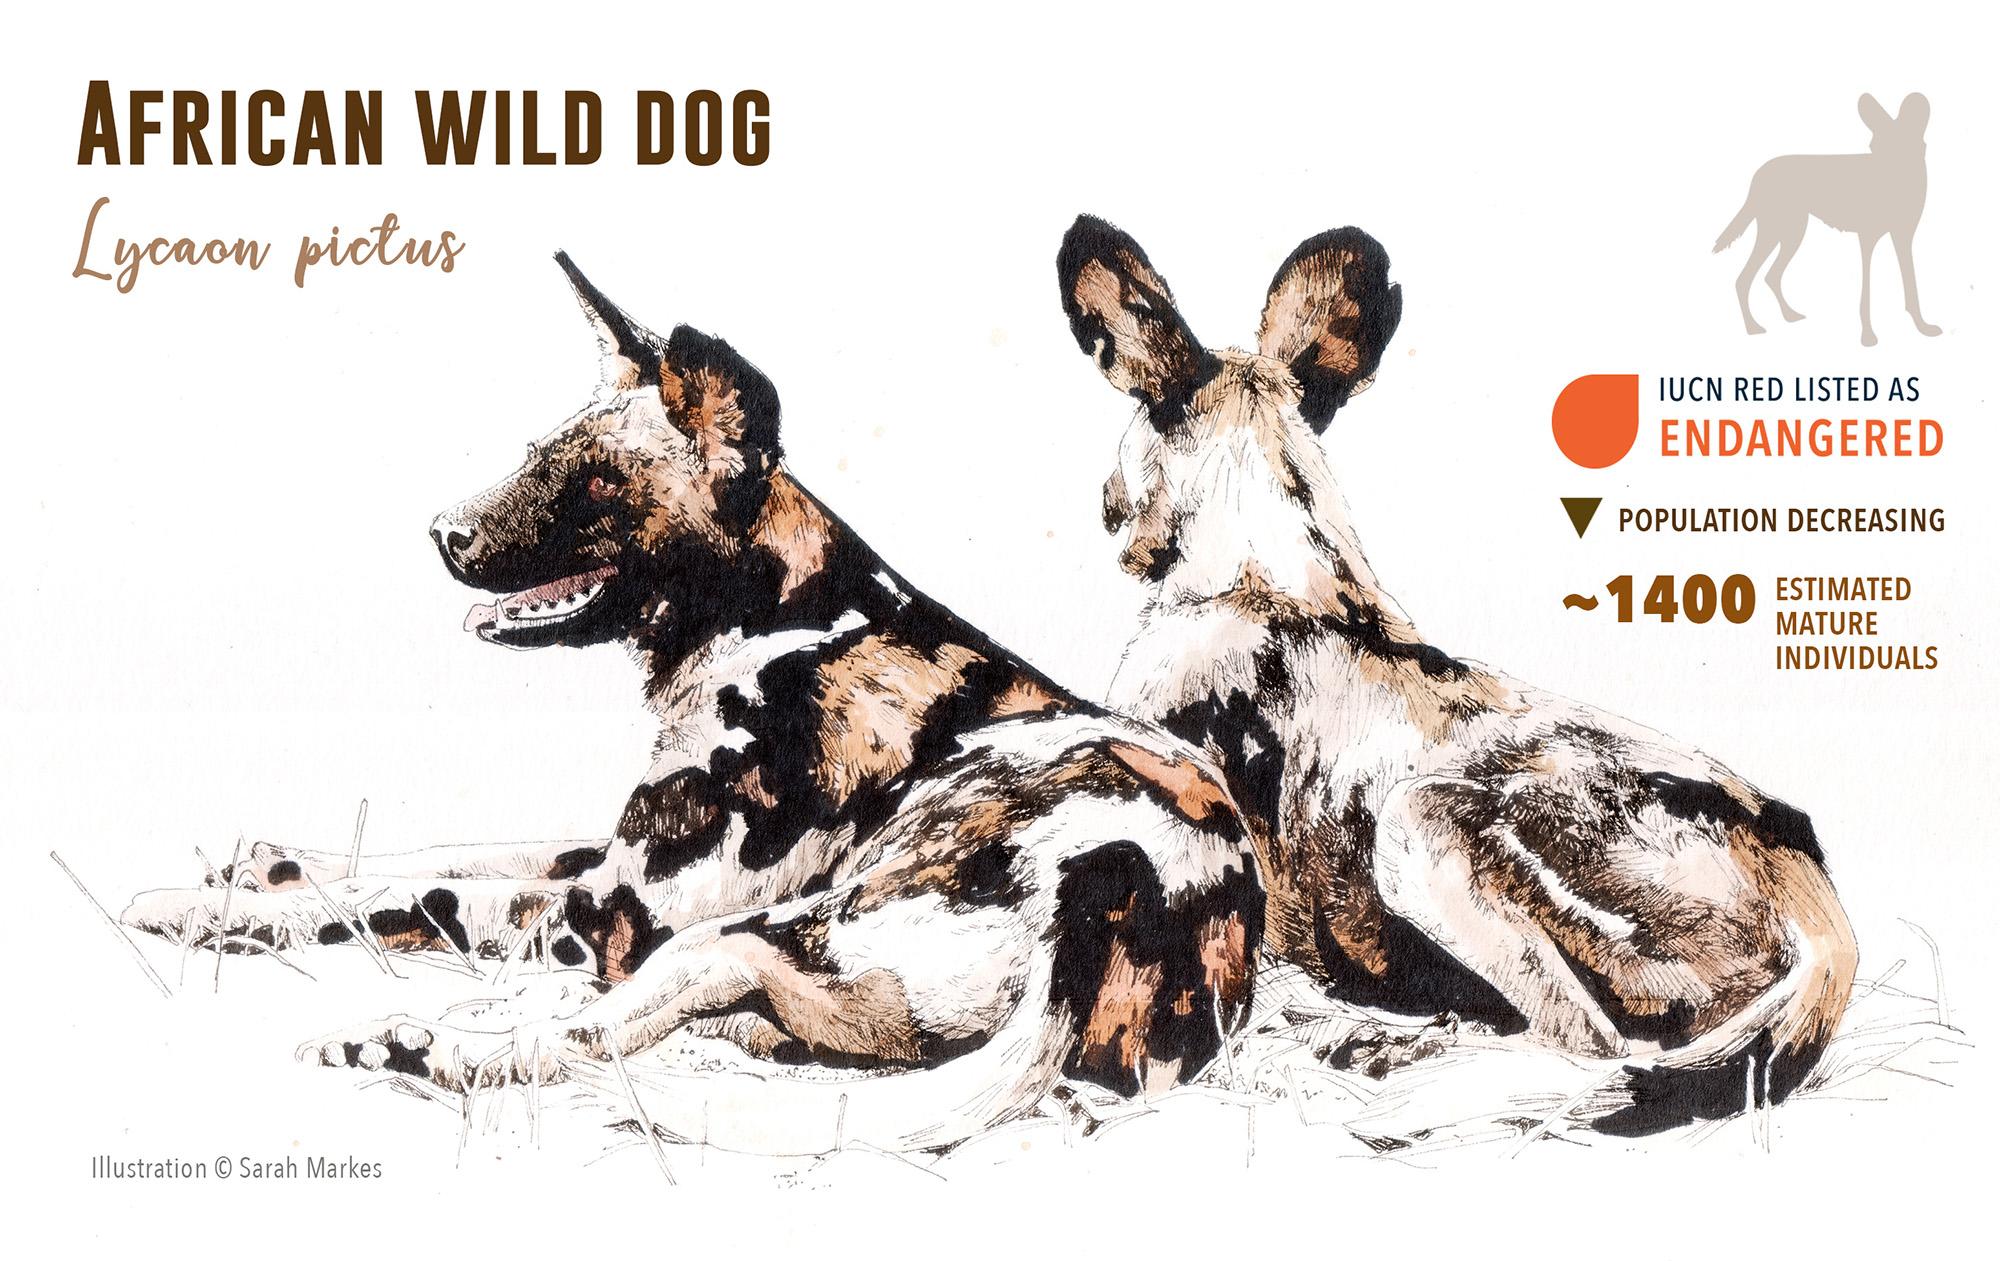 Protecting Tanzania's Wild Dogs